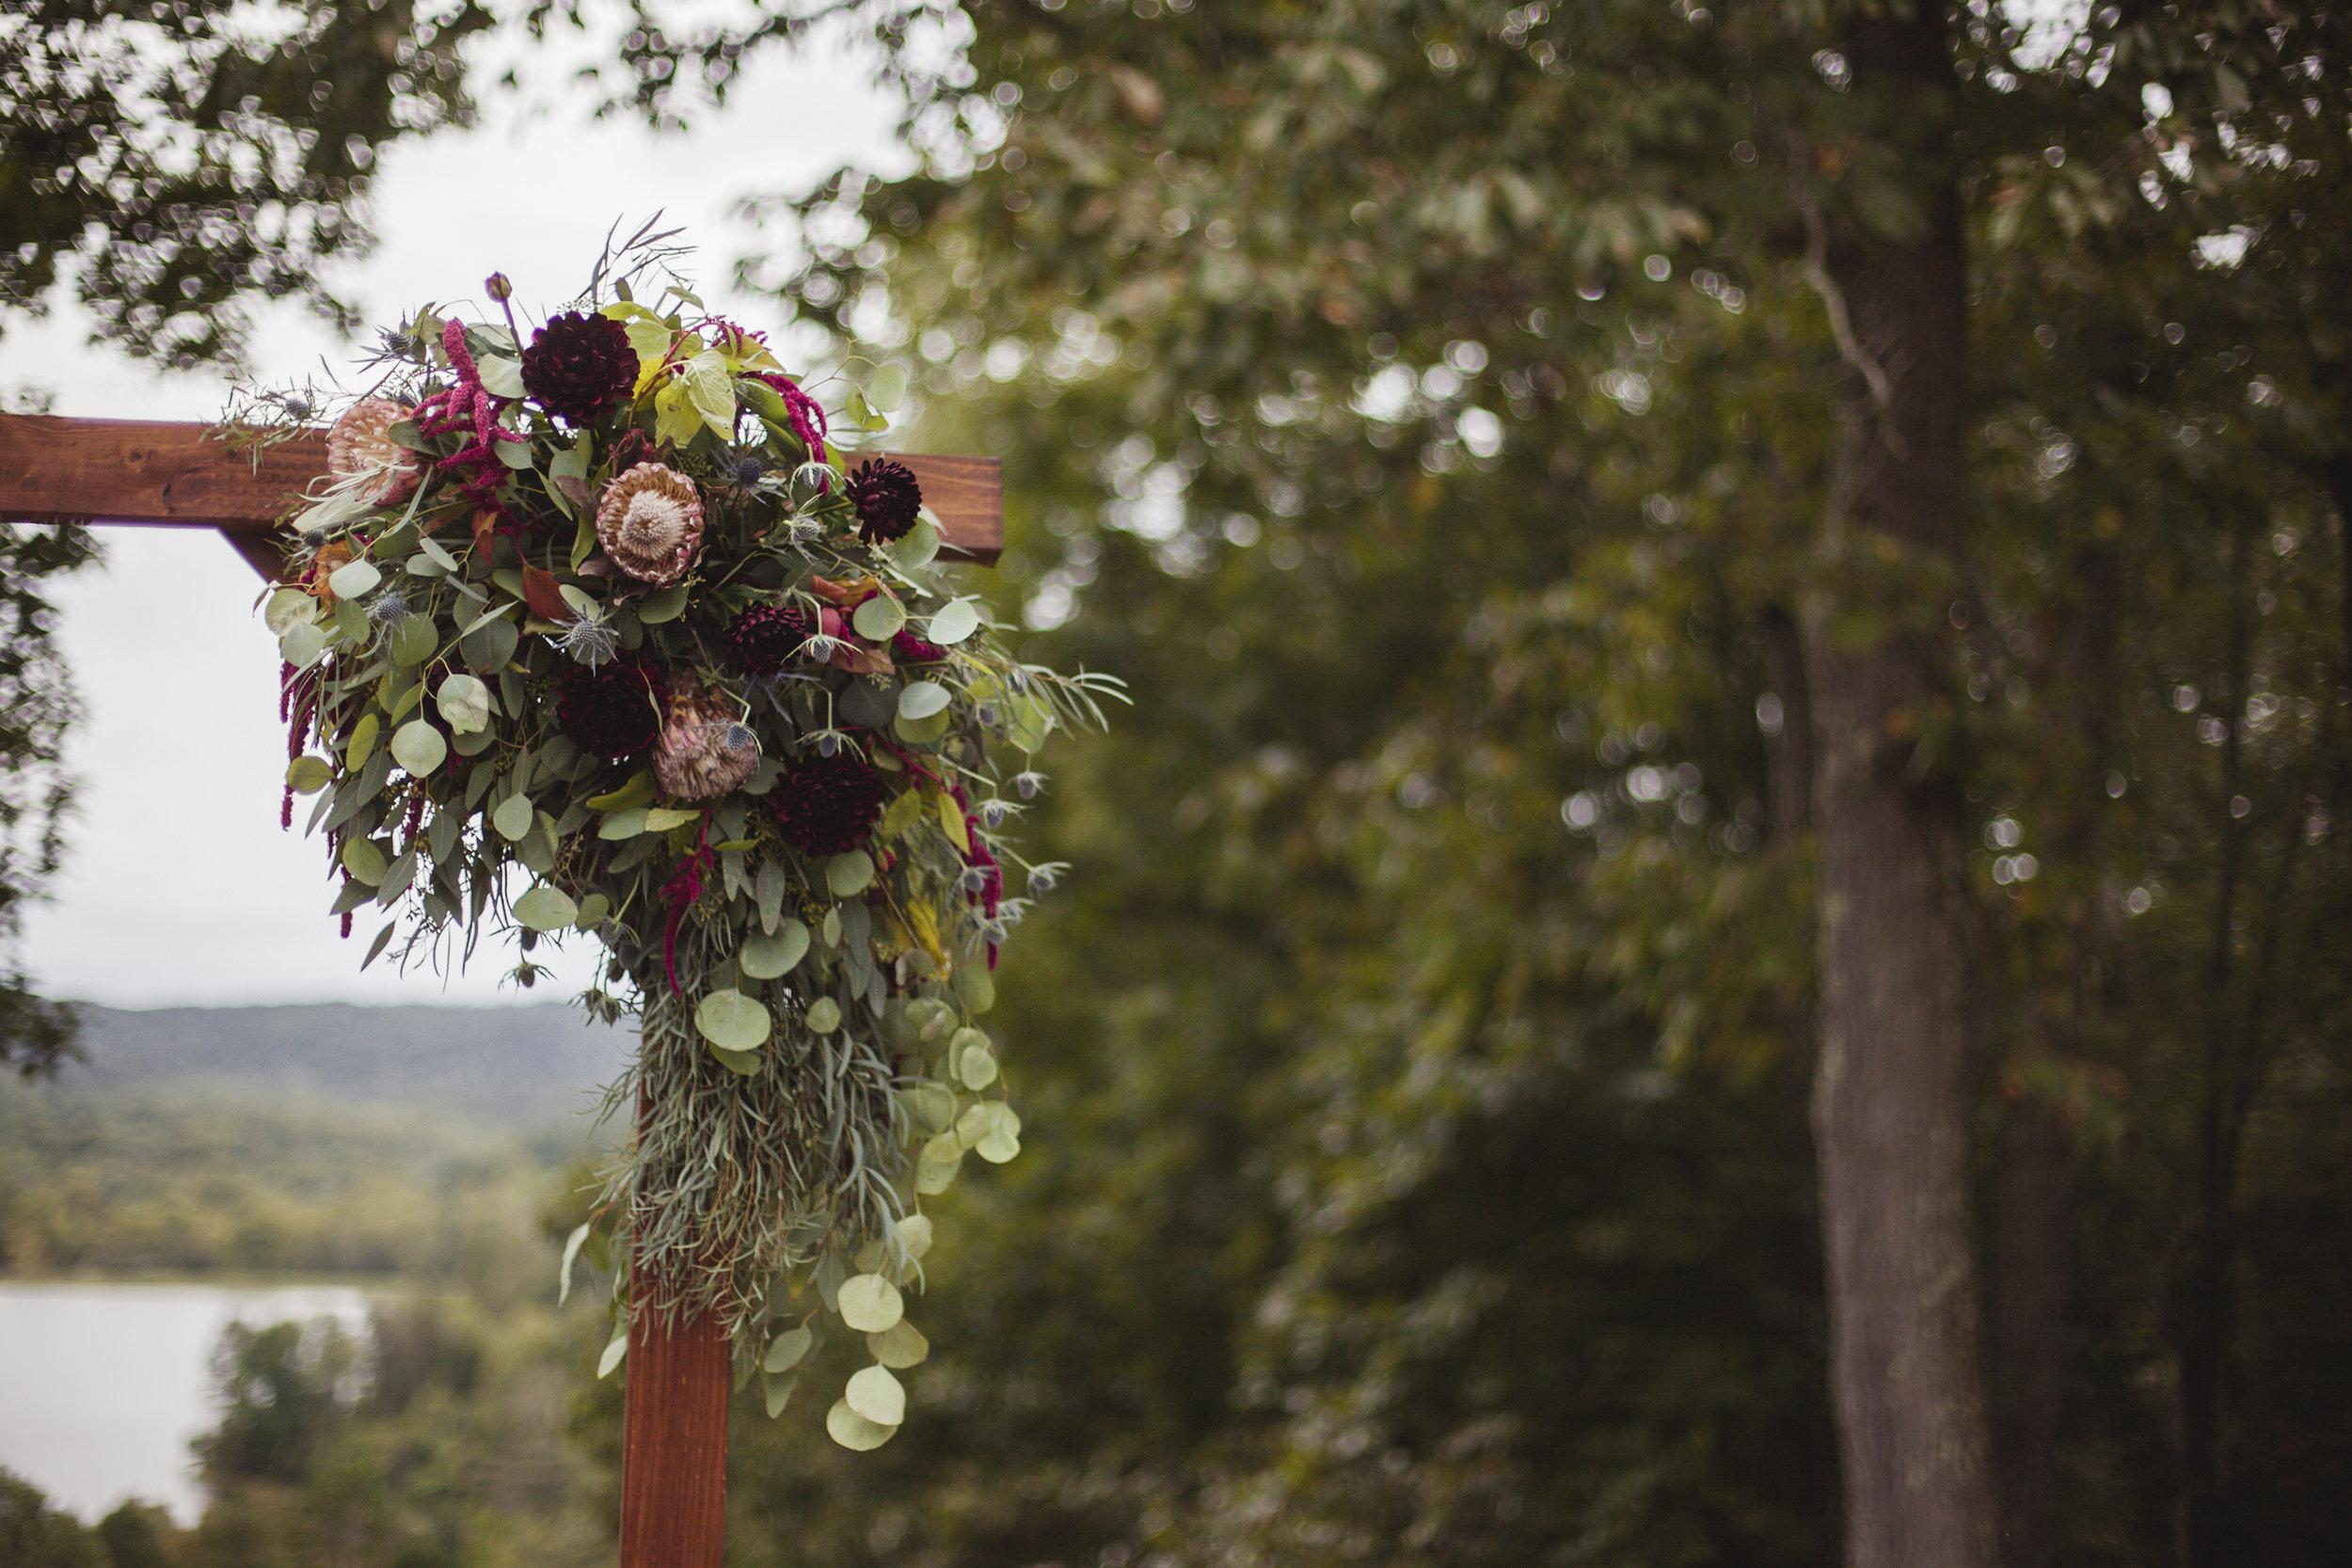 floral arch at wedding at lake upper arlington ohio photographer